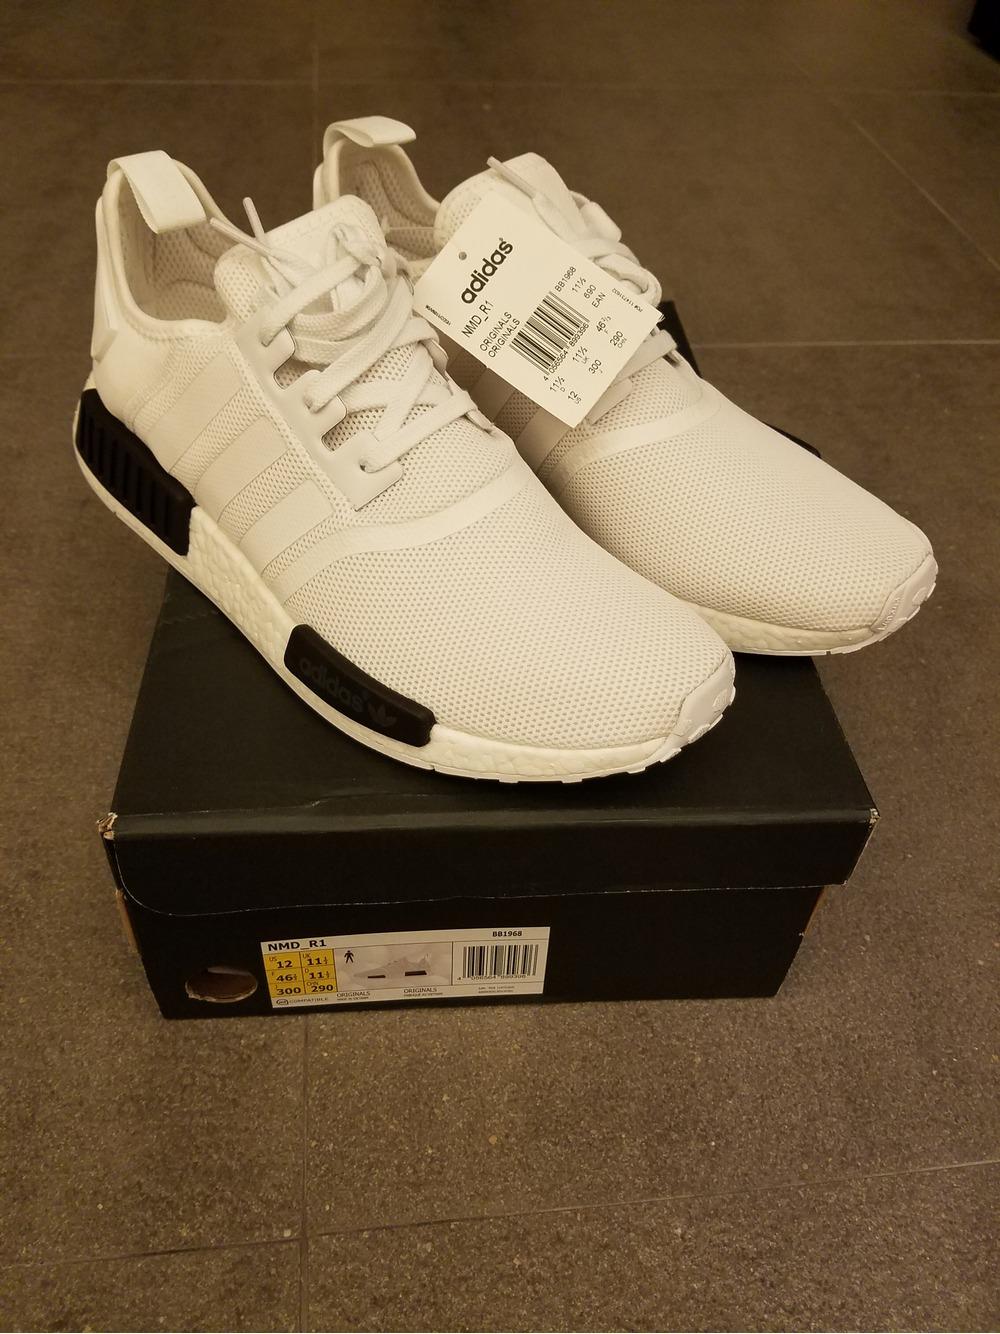 Basf Adidas NMD XR1 S32215 Black white Orange Yupoo